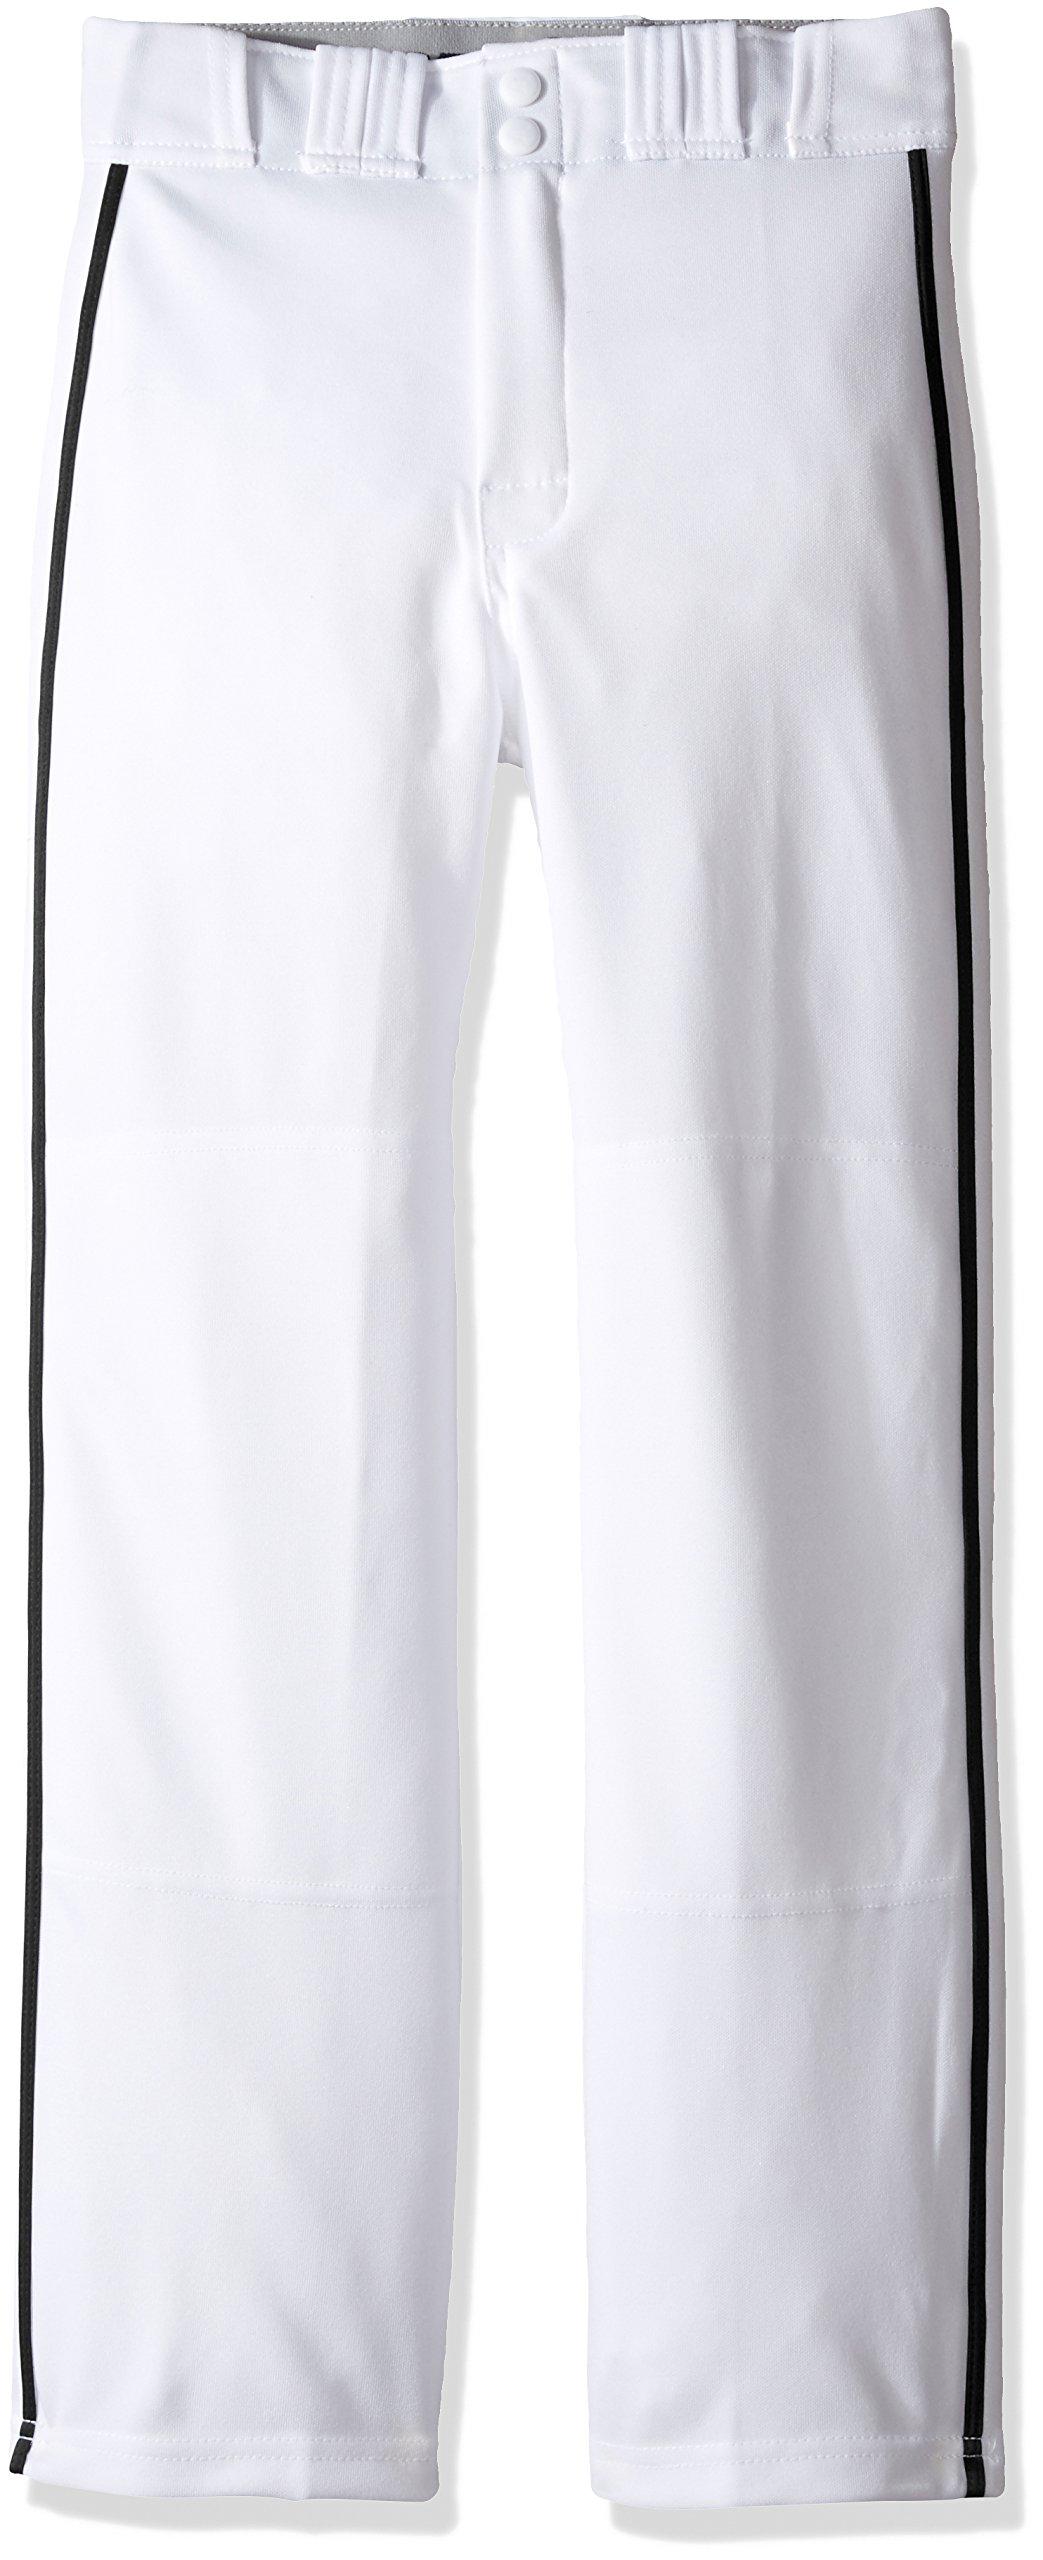 Easton Rival 2 Baseball Softball Pant | Youth | Small | White Black | 2020 | Double Reinforced Knee | Elastic Waistband w/ 2 Color Internal Logo | 2 Batting Glove Pockets | 100% Polyester